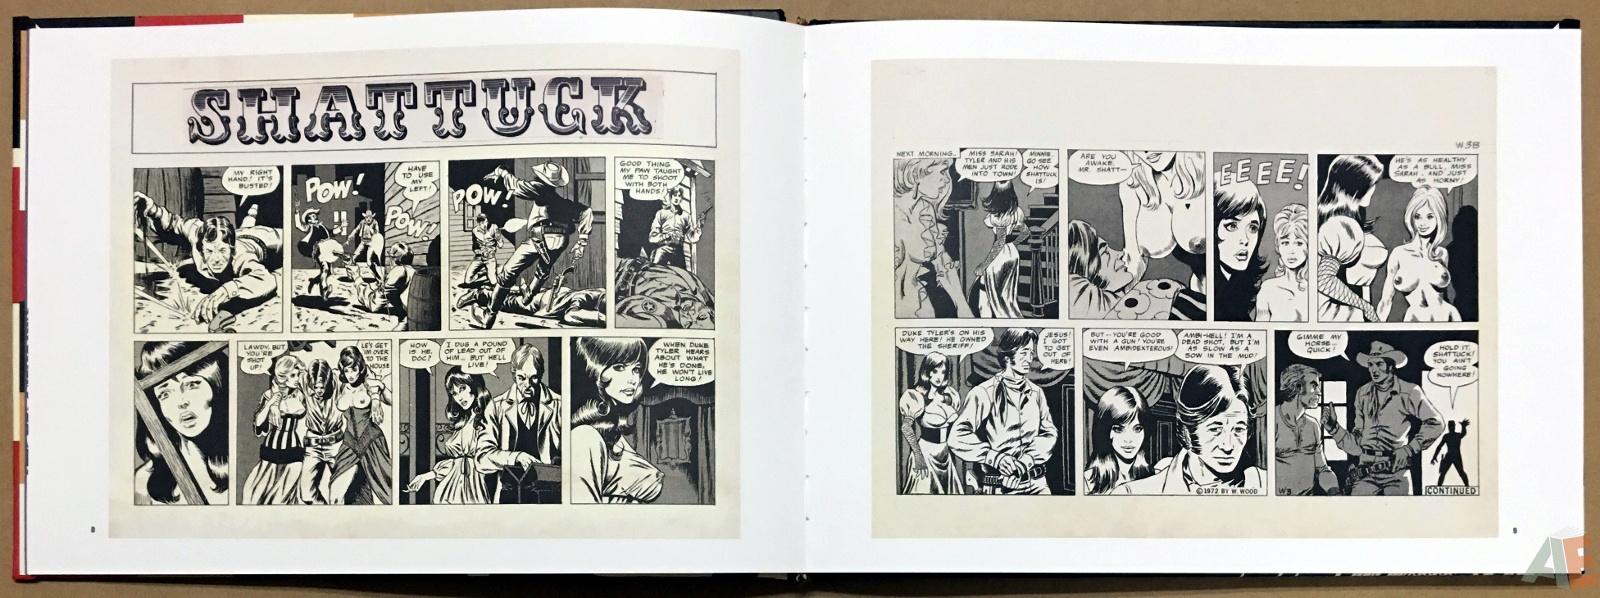 Wallace Wood Presents Shattuck Original Art Edition 8